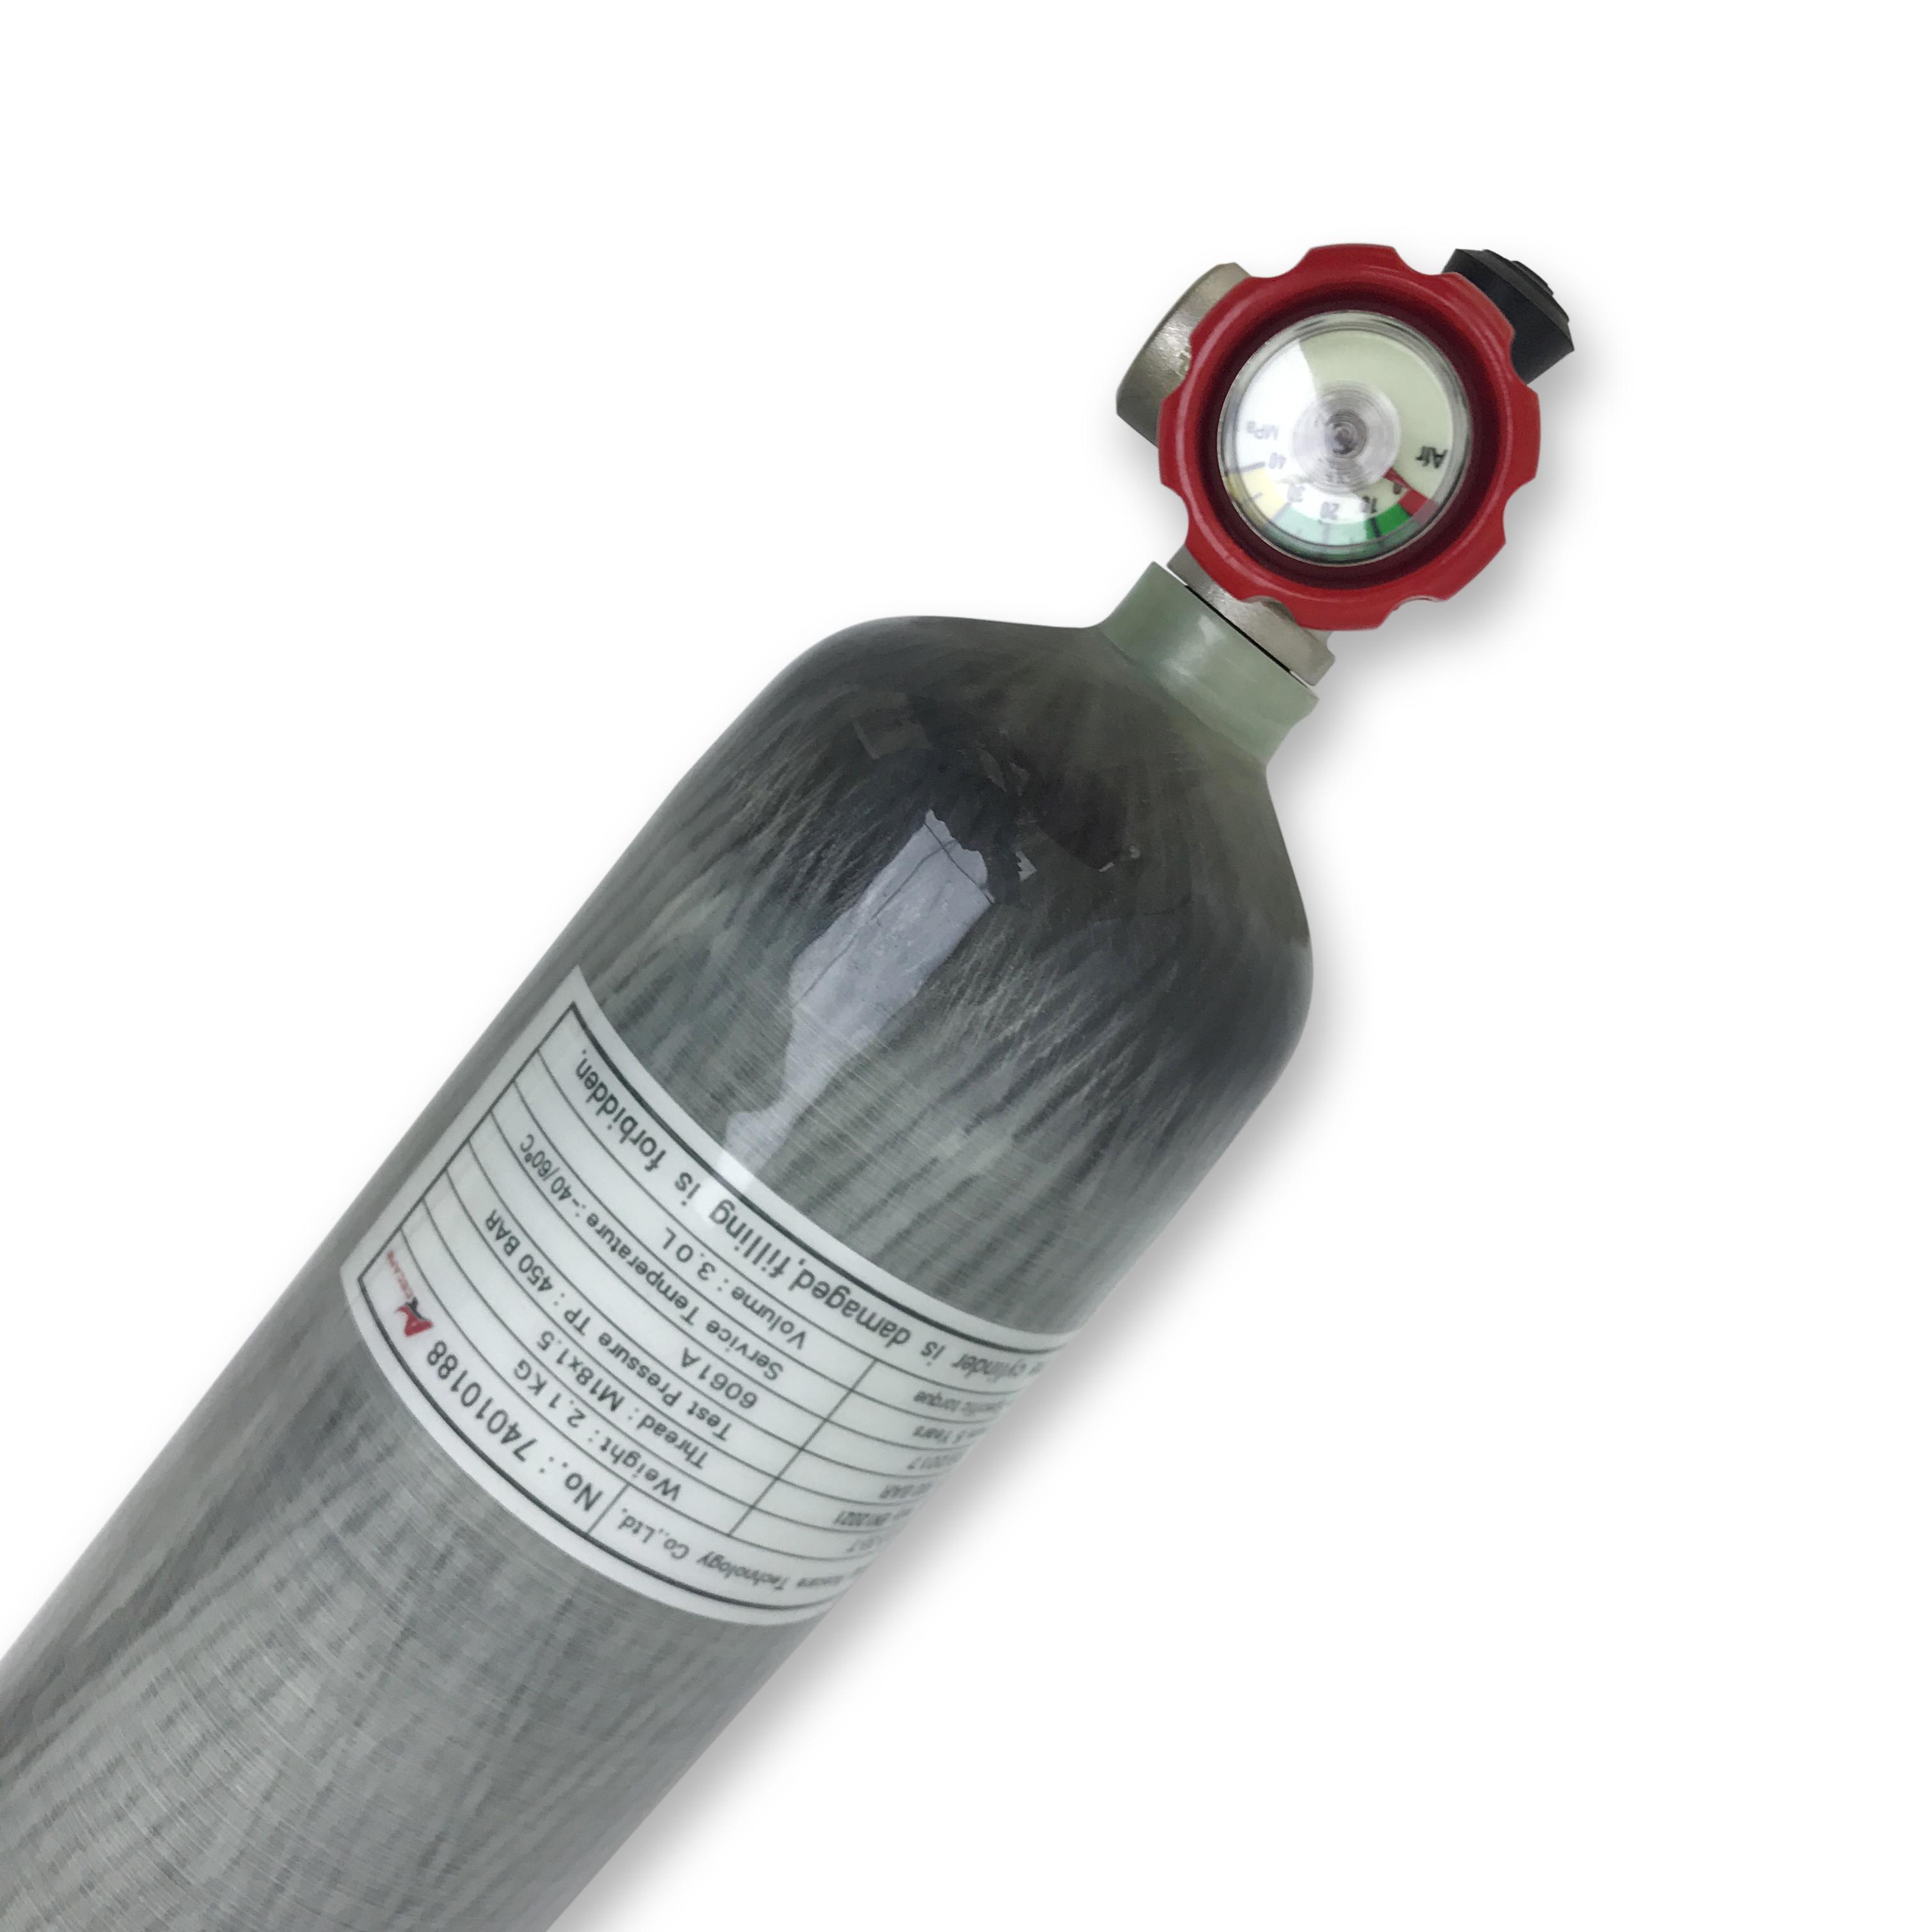 Relleno AC10311 Acecare de China de aire comprimido del cilindro CE 3L 30 MPa 4500psi fibra de carbono buceo con tanque SCBA Cilindro Cilindro de gas con válvula de la PCP